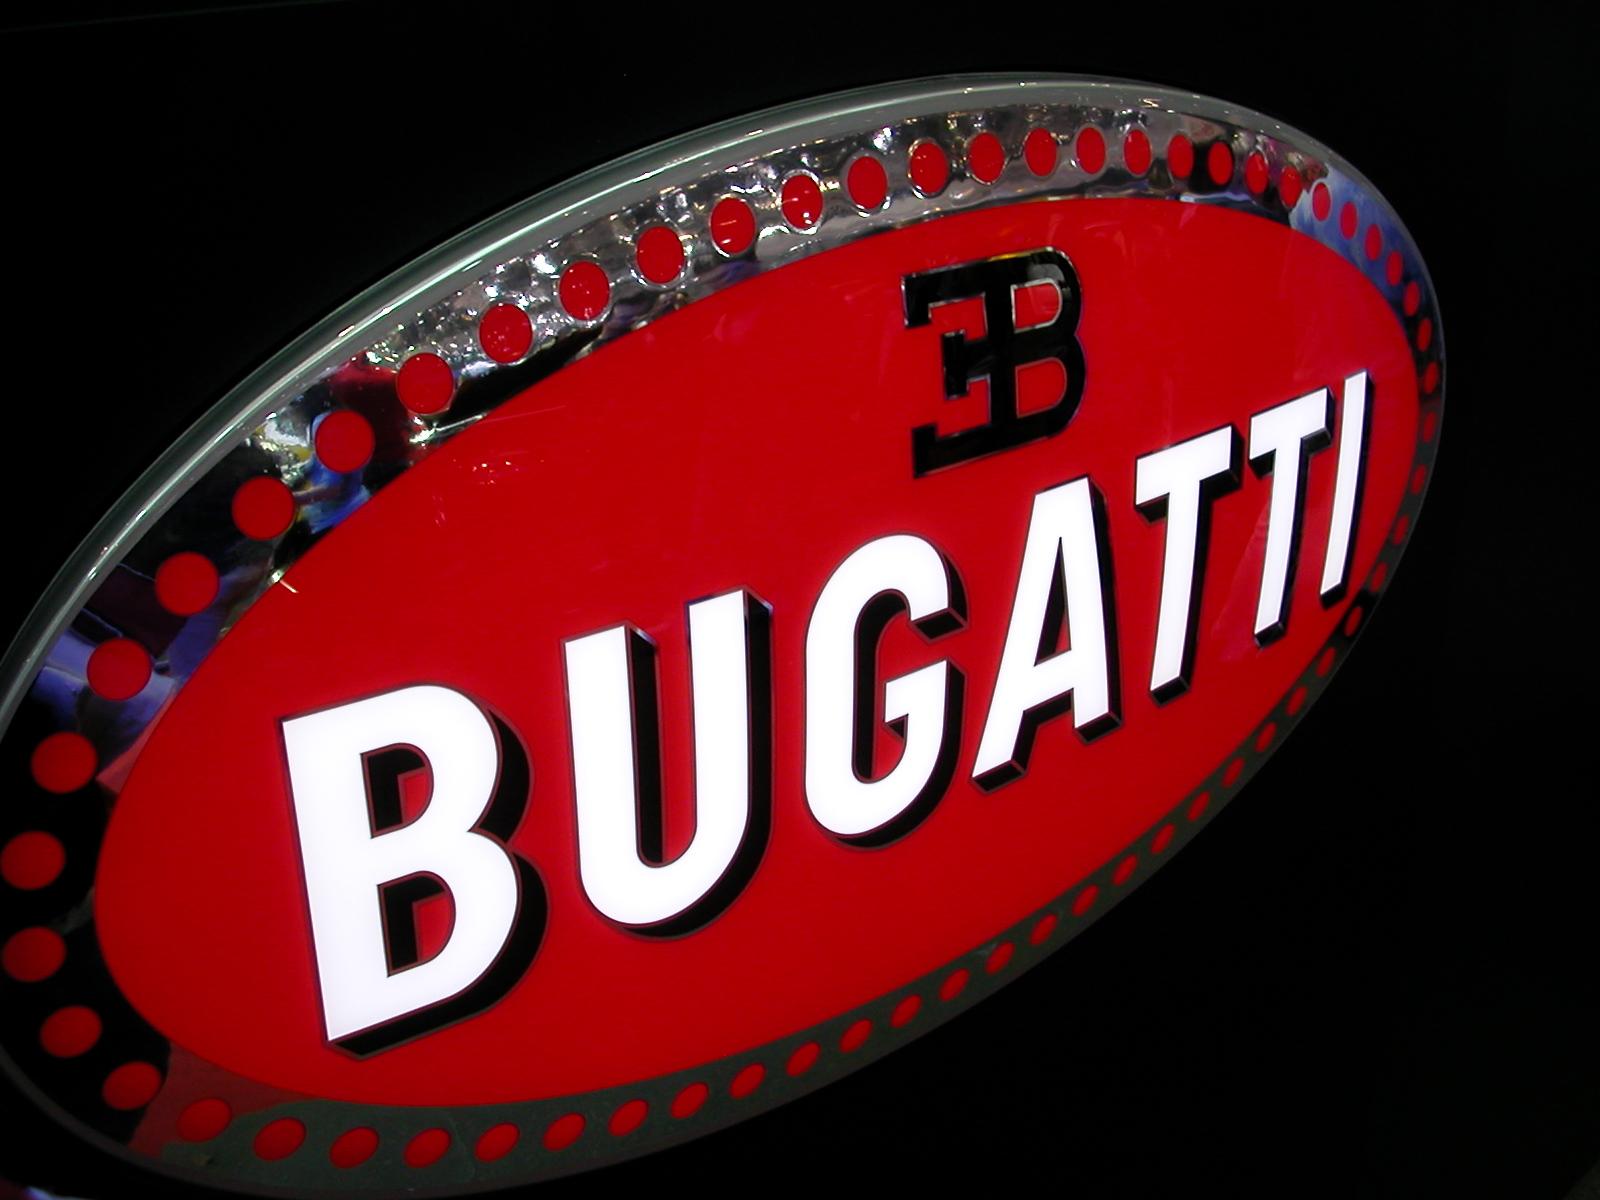 bugatti logo wallpaper - photo #14